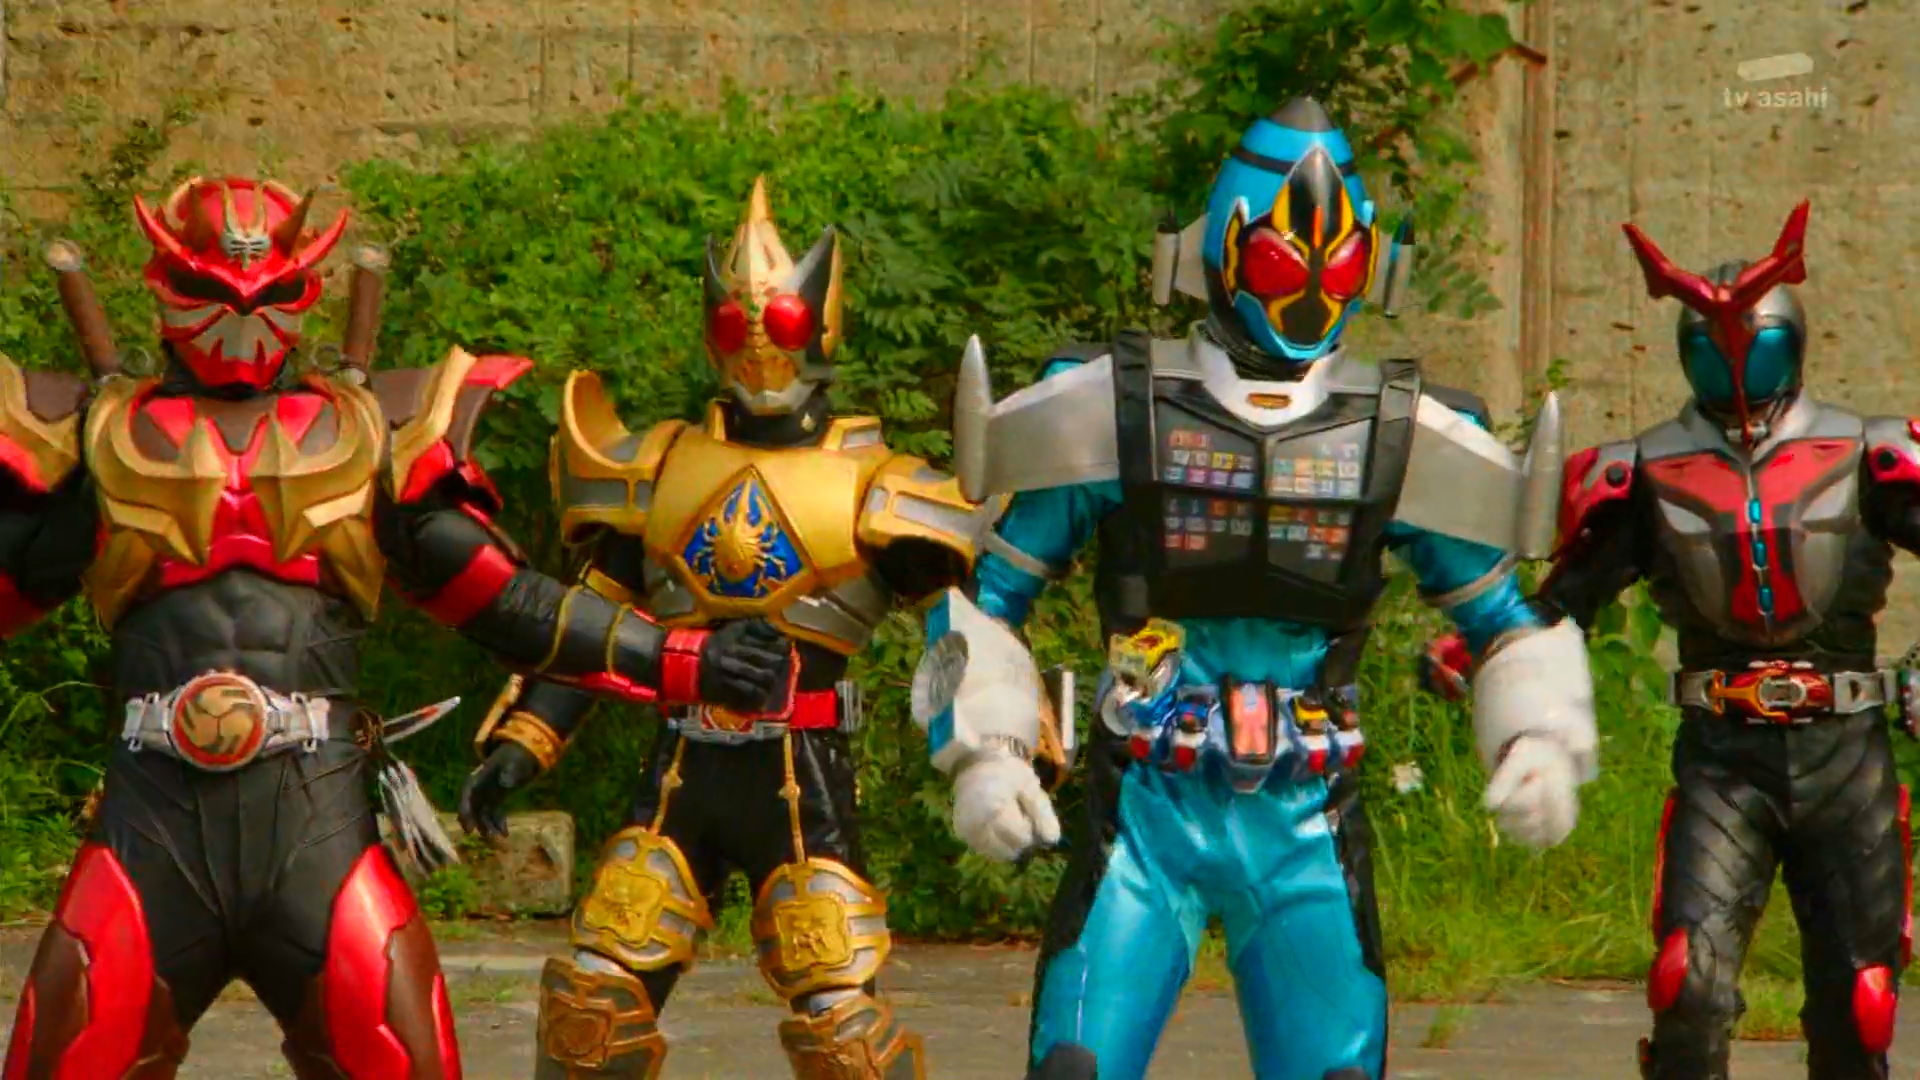 Kamen Rider Blade By Lamchunhin On Deviantart Kamen Rider Rider Kamen Rider Ryuki